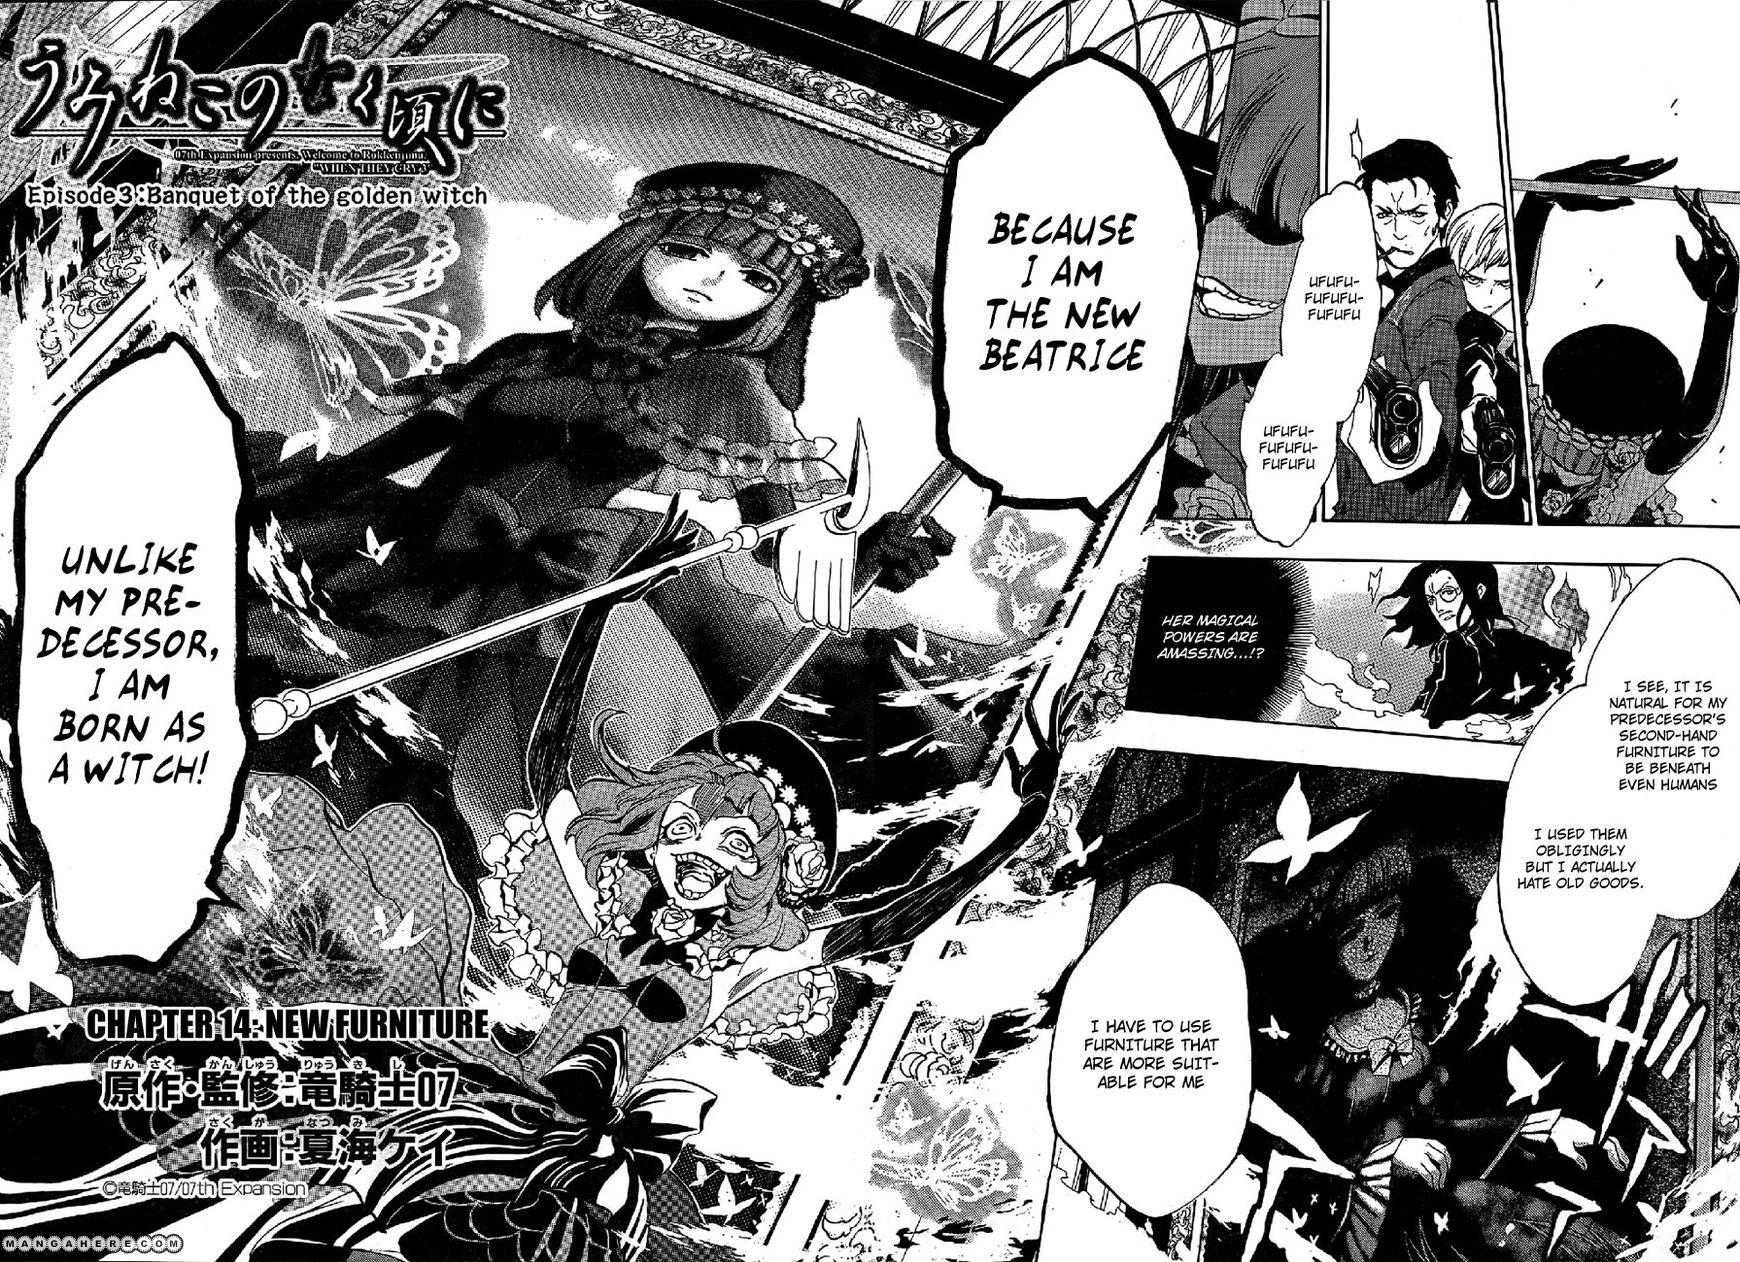 Umineko no Naku Koro ni Episode 3: Banquet of the Golden Witch 14 Page 2